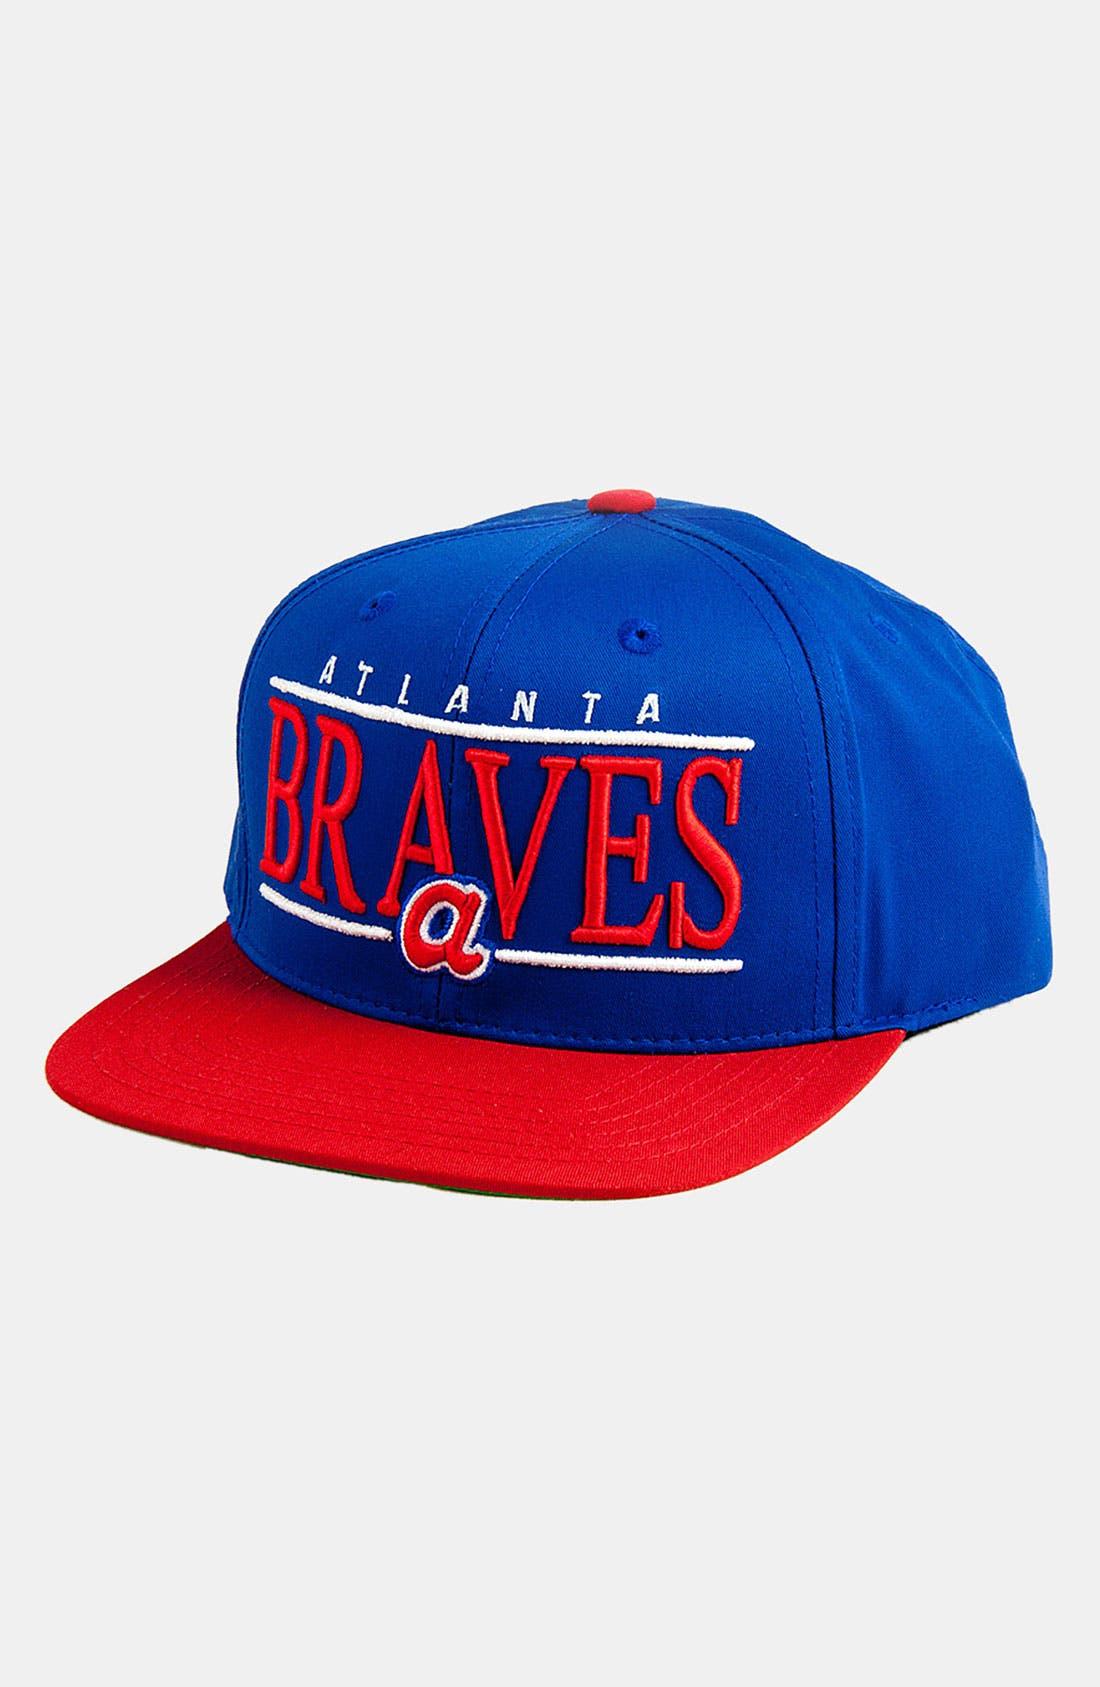 Alternate Image 1 Selected - American Needle 'Atlanta Braves - Nineties' Twill Snapback Baseball Cap